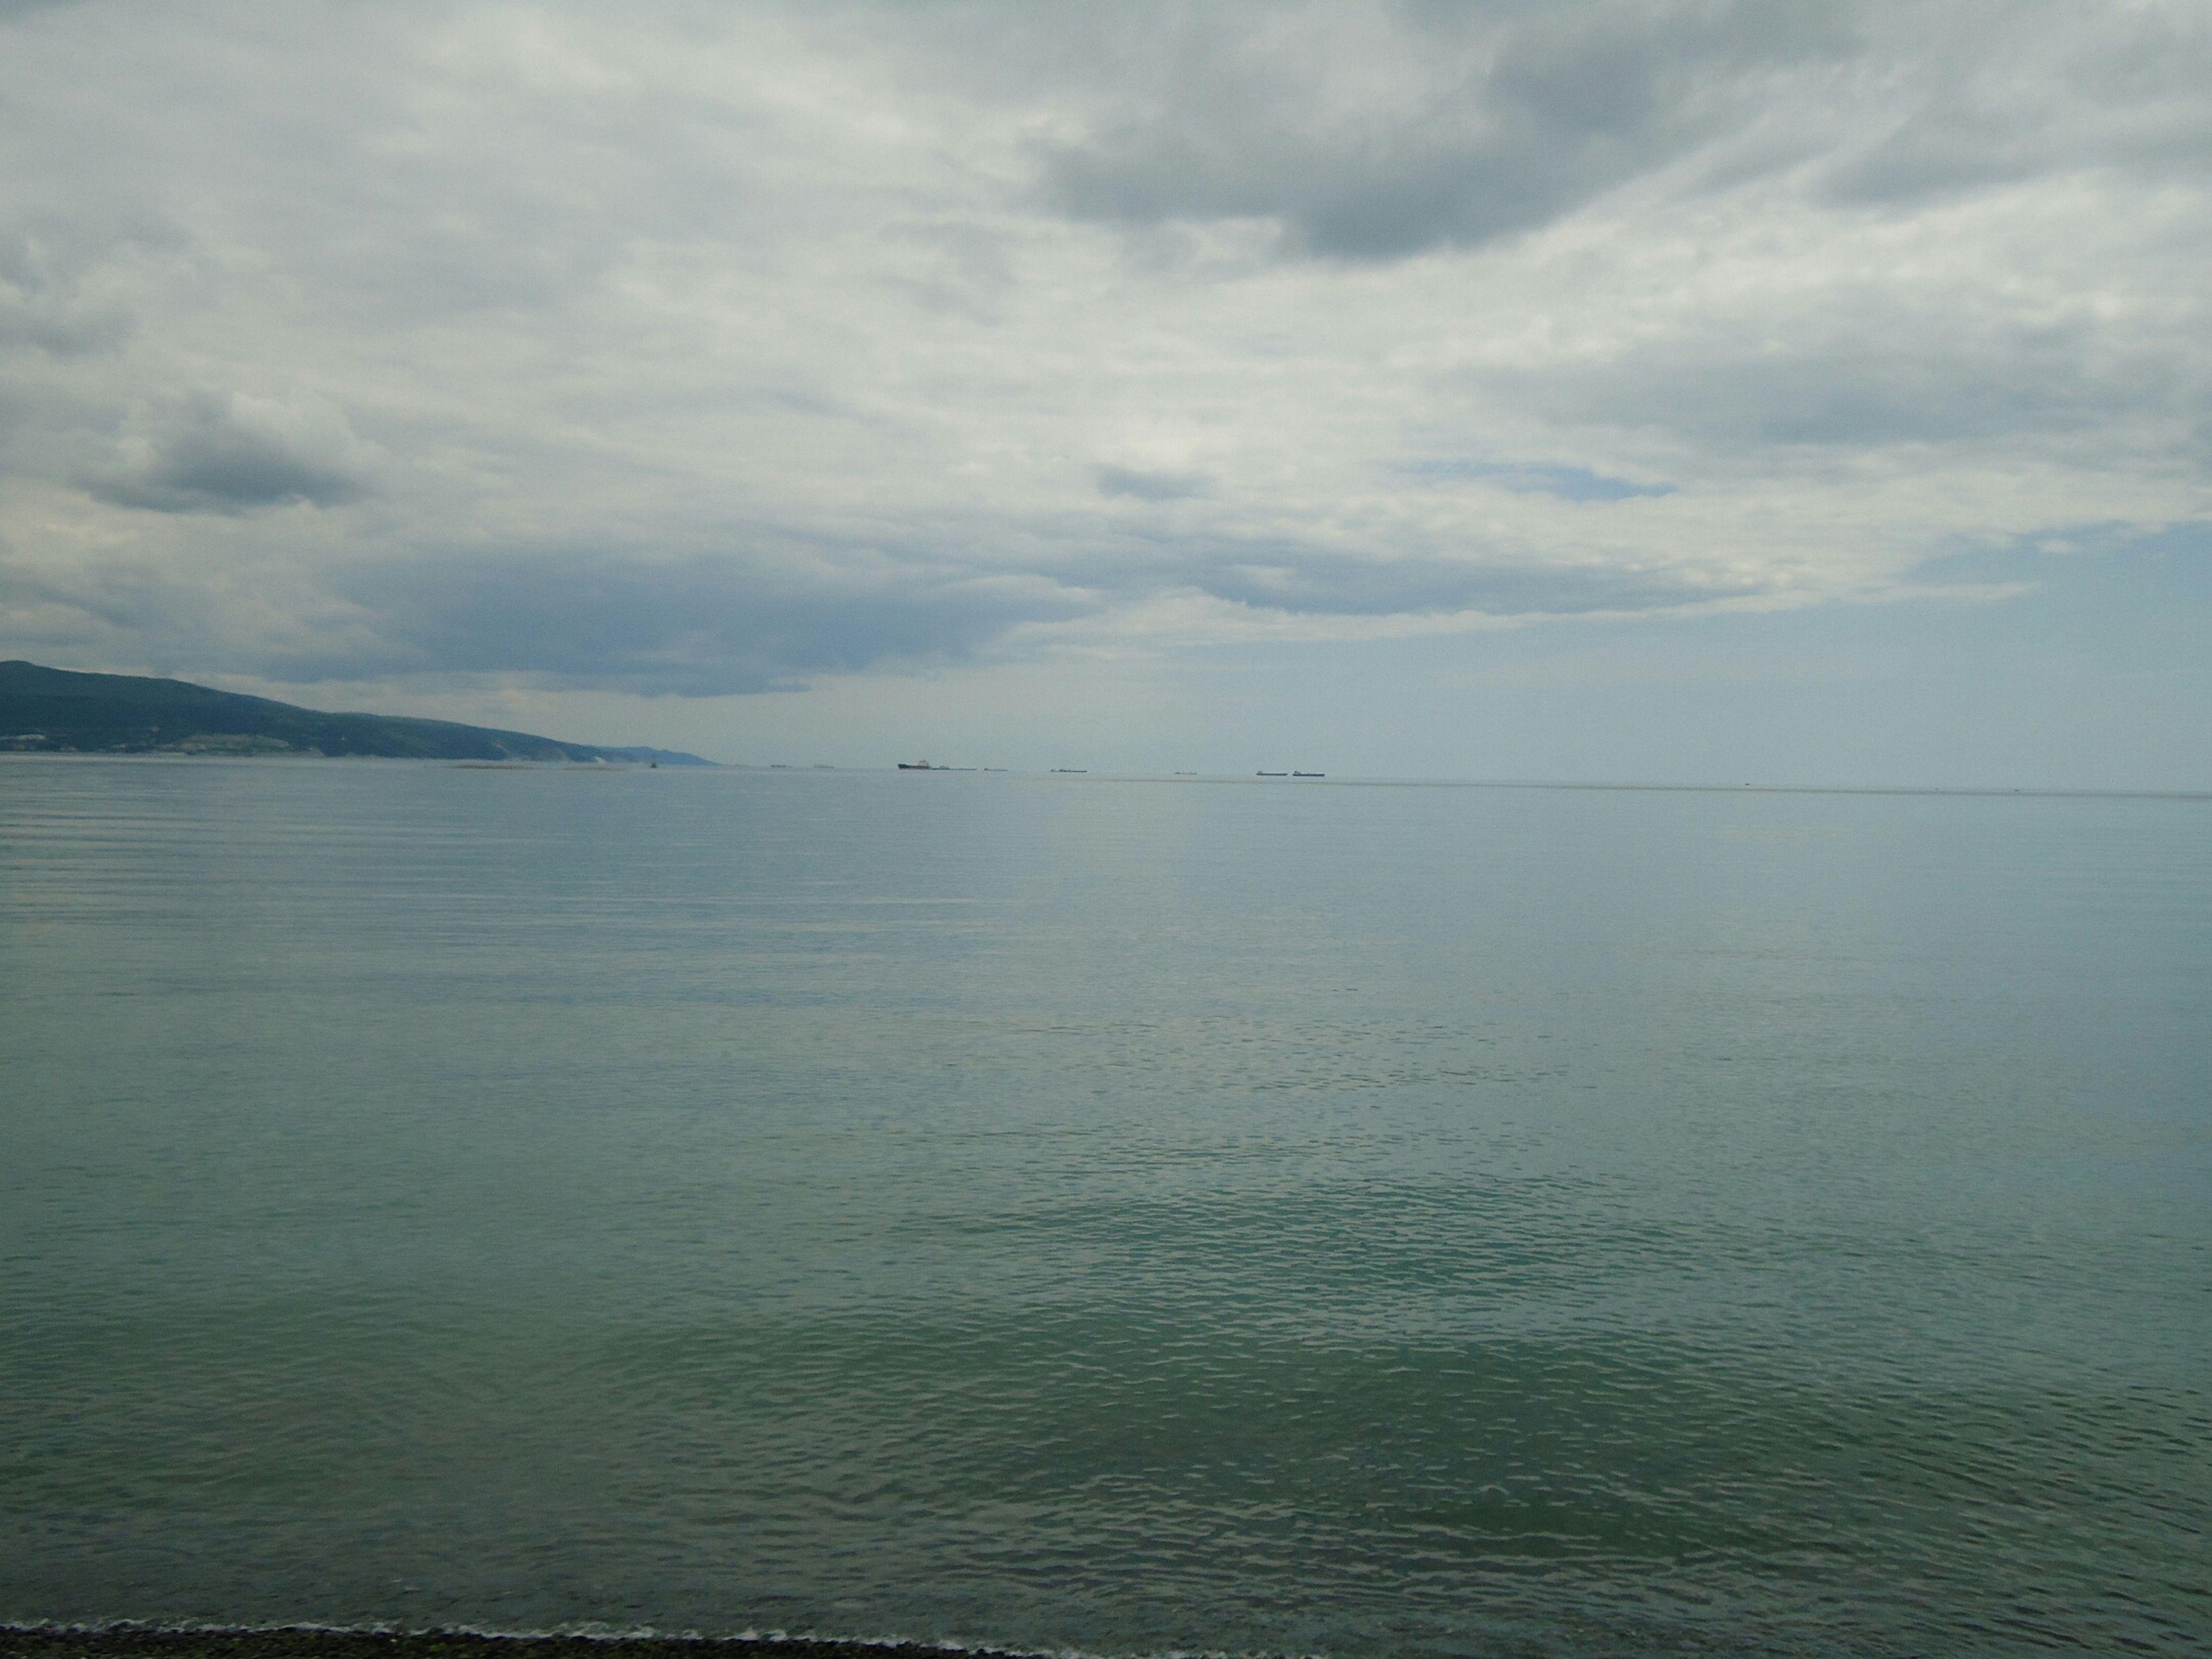 MirrorSea Sea Spring MiroirD'eau Mer Printemps ЗеркальнаяГладь Море весна Negative Space